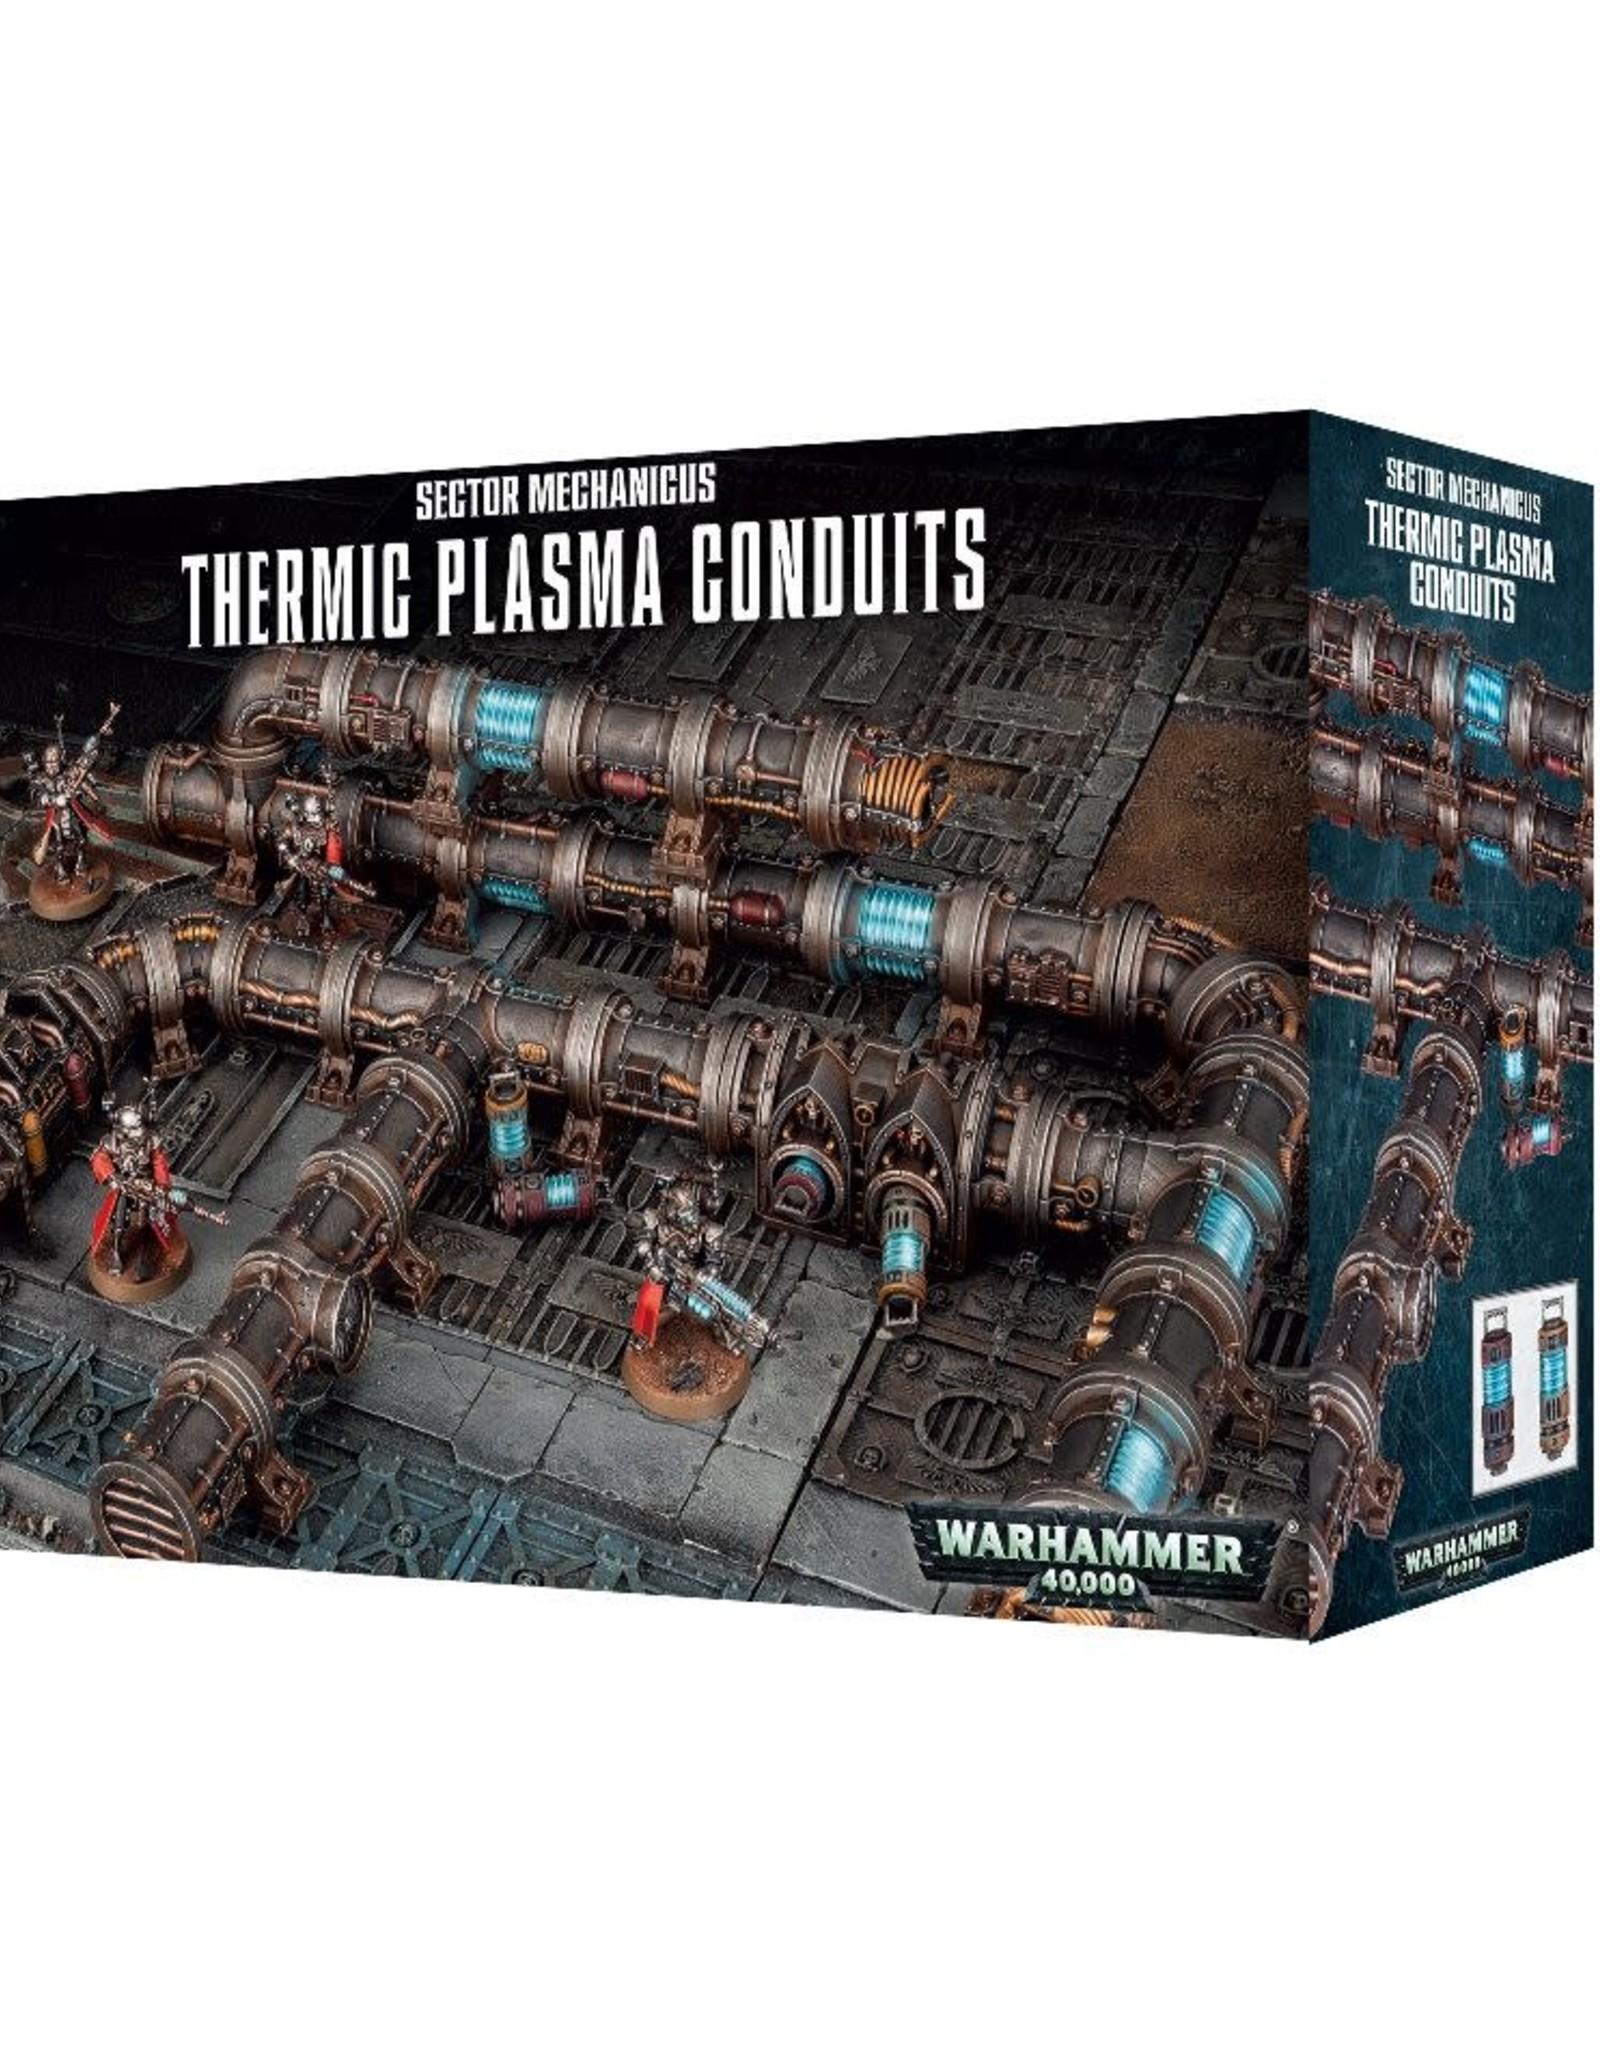 Warhammer 40K Sector Mechanicus: Thermic Plasma Conduits